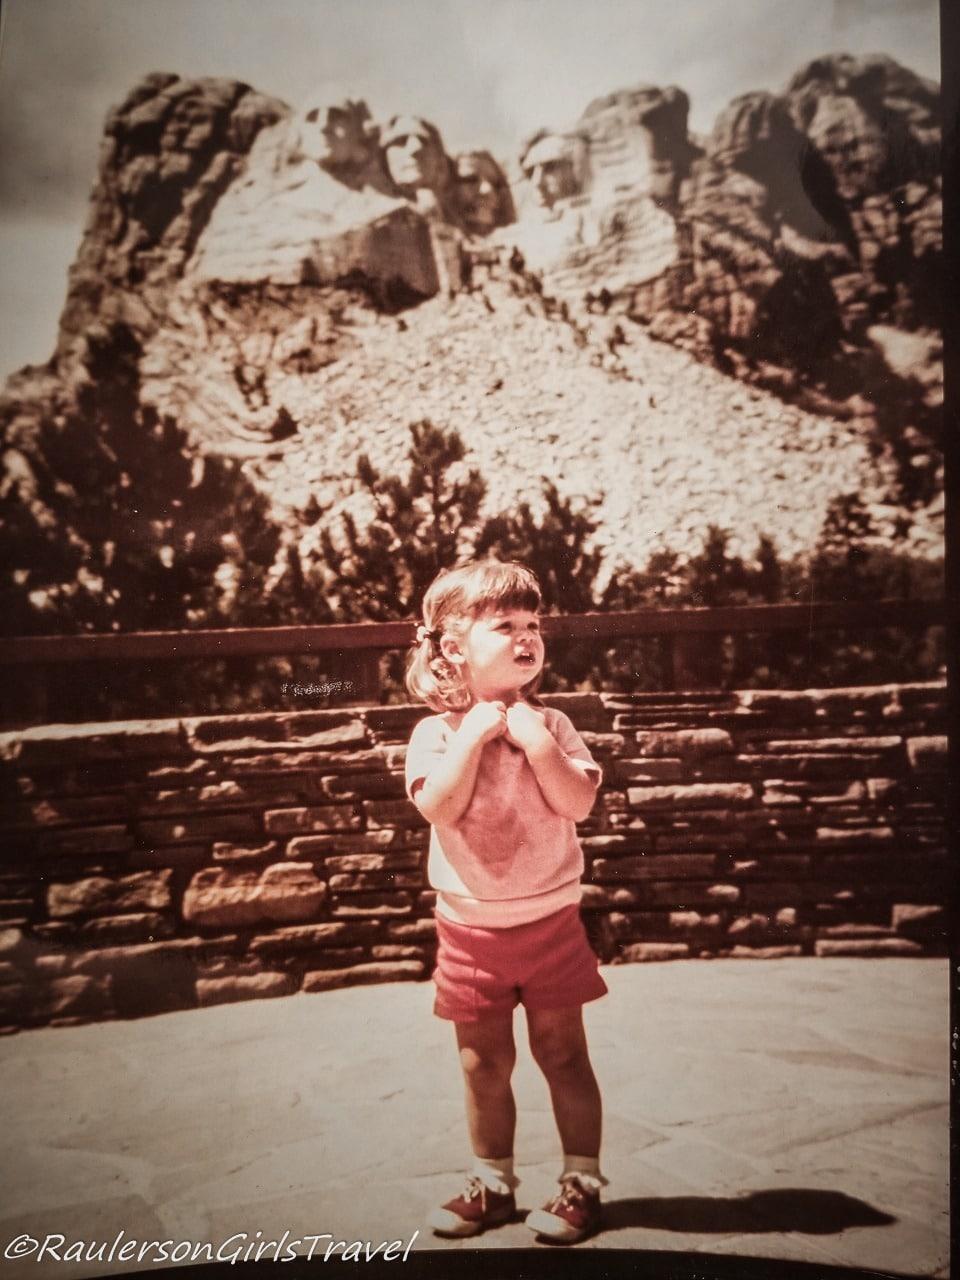 Heather at Mount Rushmore